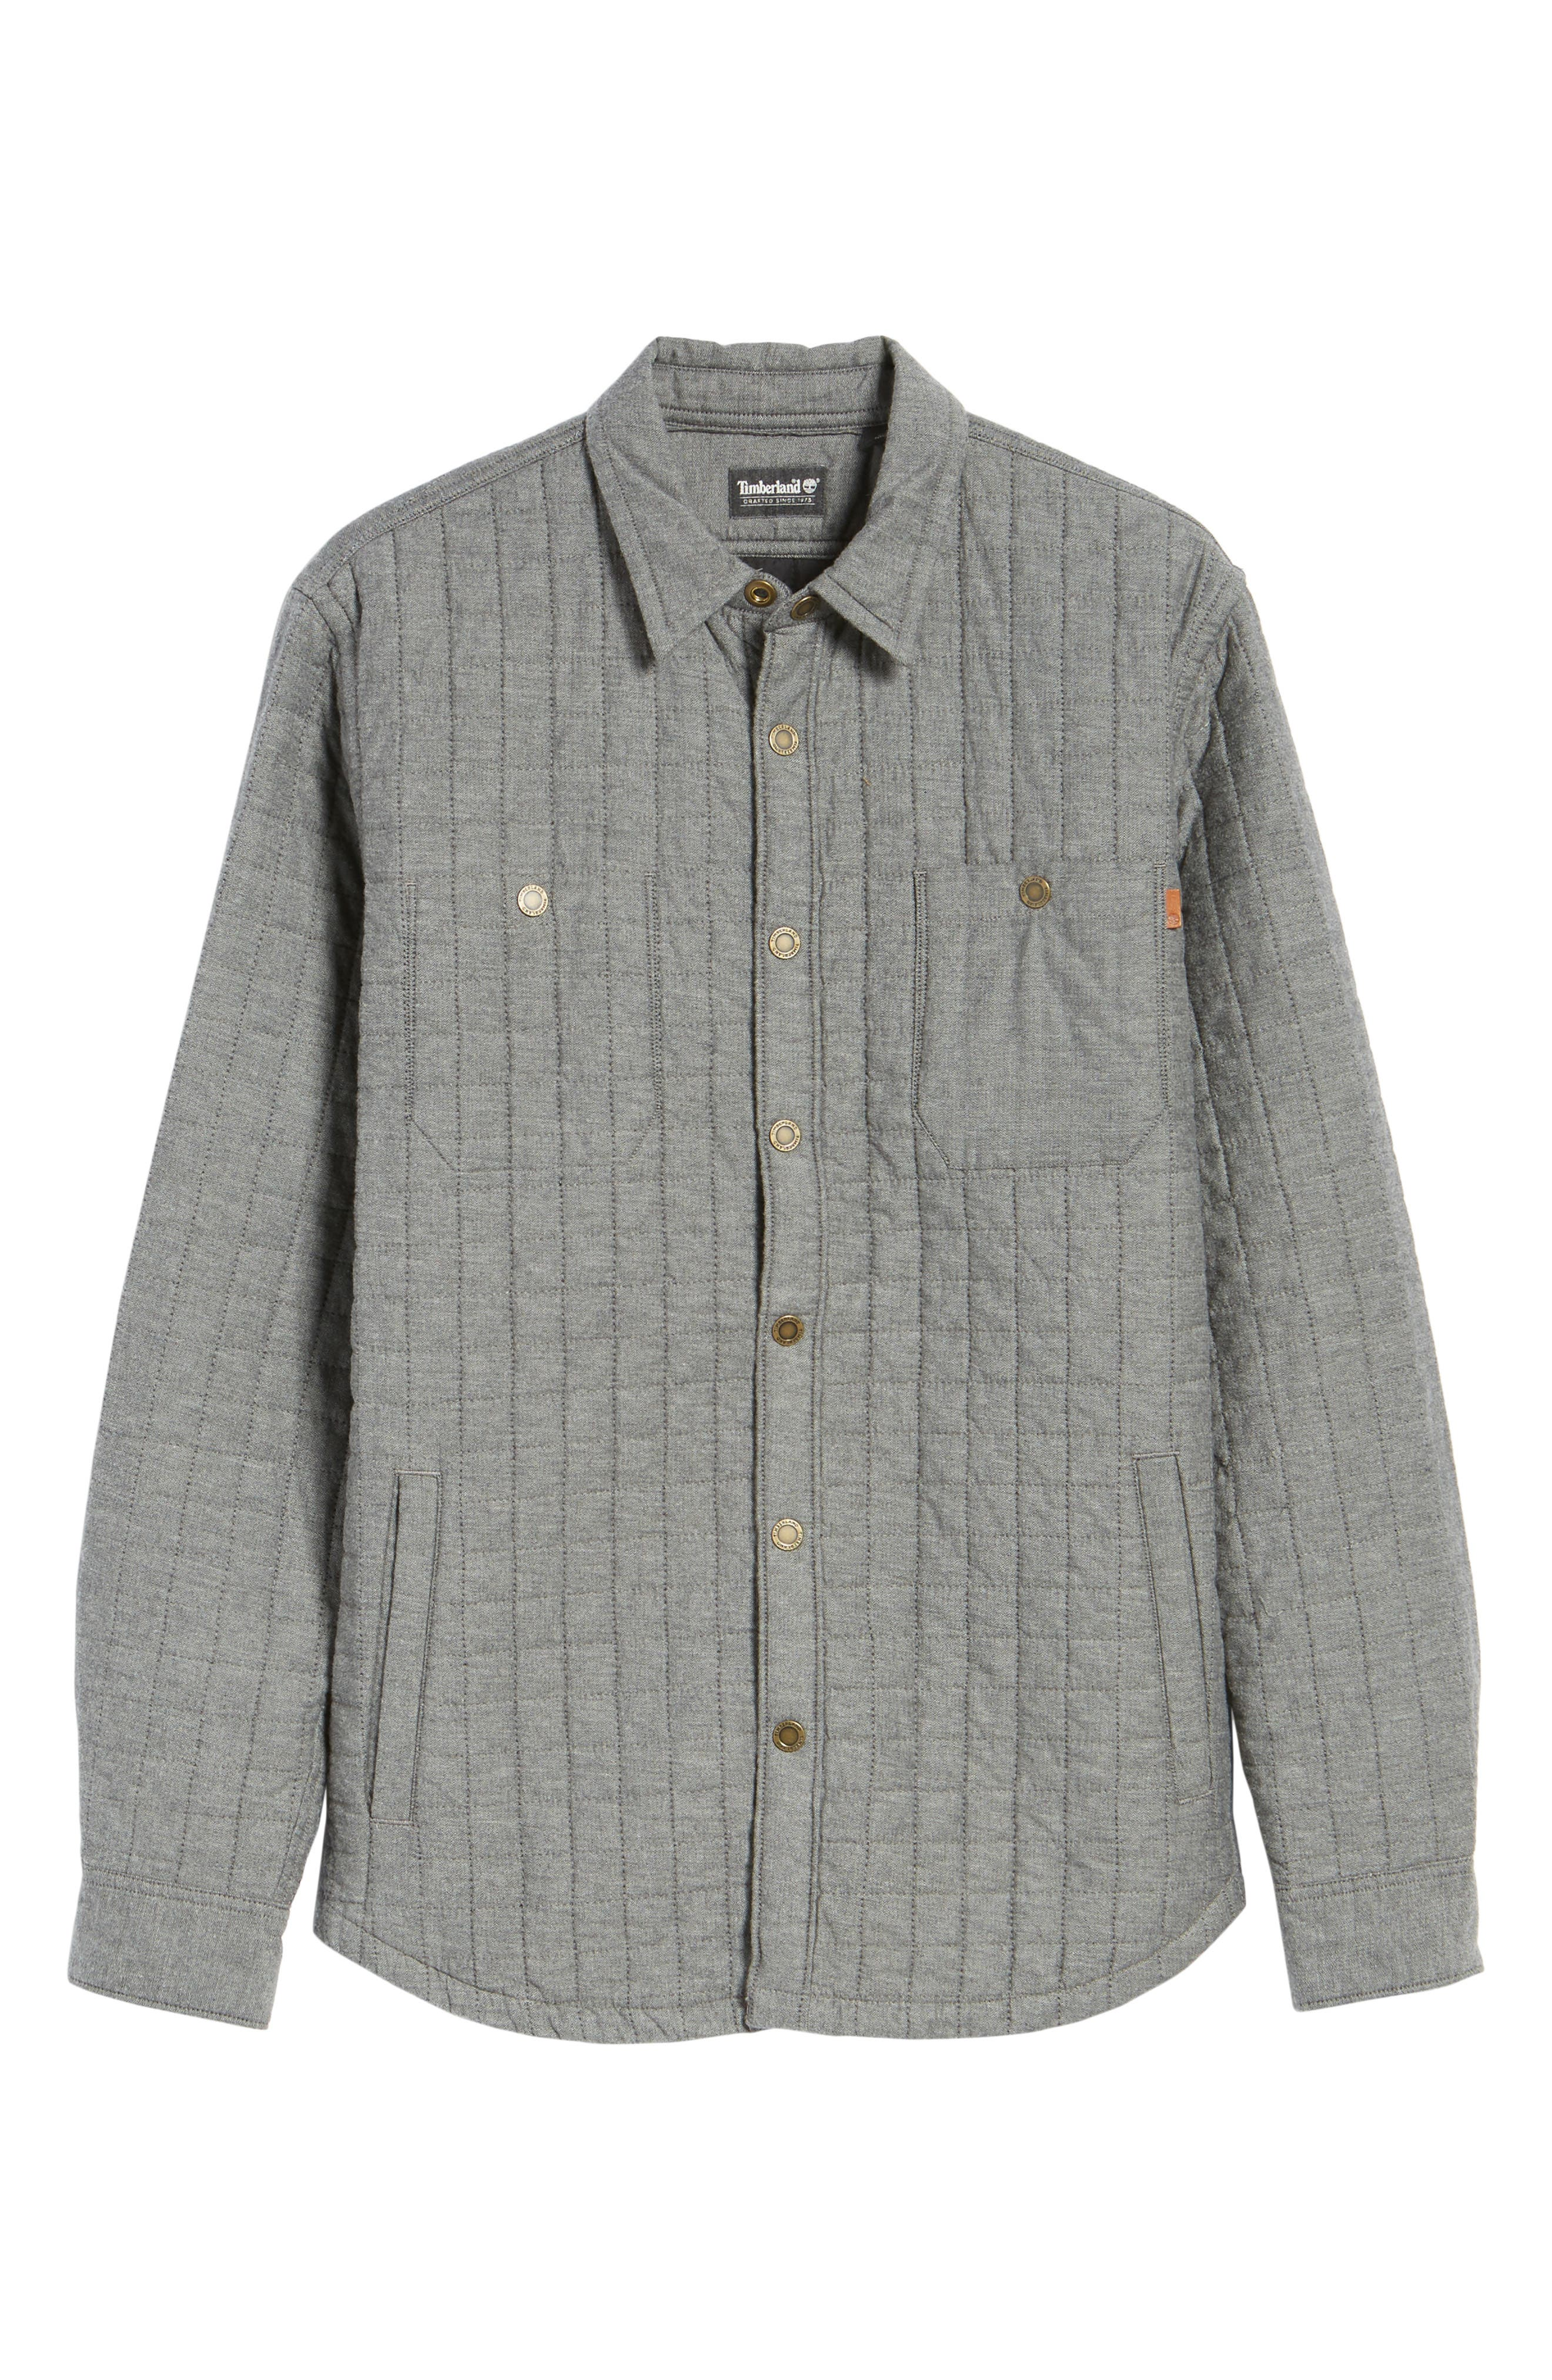 Gunstock River Lightweight Quilted Shirt Jacket,                             Alternate thumbnail 6, color,                             Grey